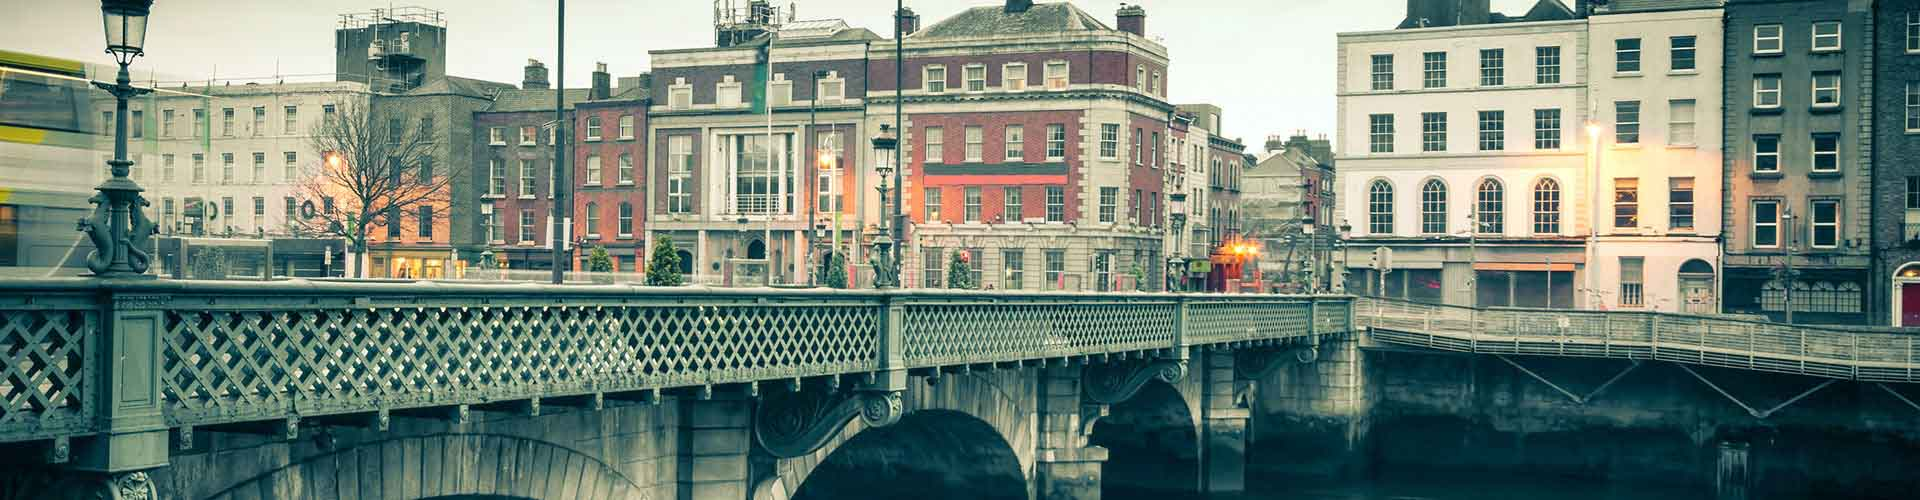 Dublin – Hostels in Dublin. Maps for Dublin, Photos and Reviews for each hostel in Dublin.